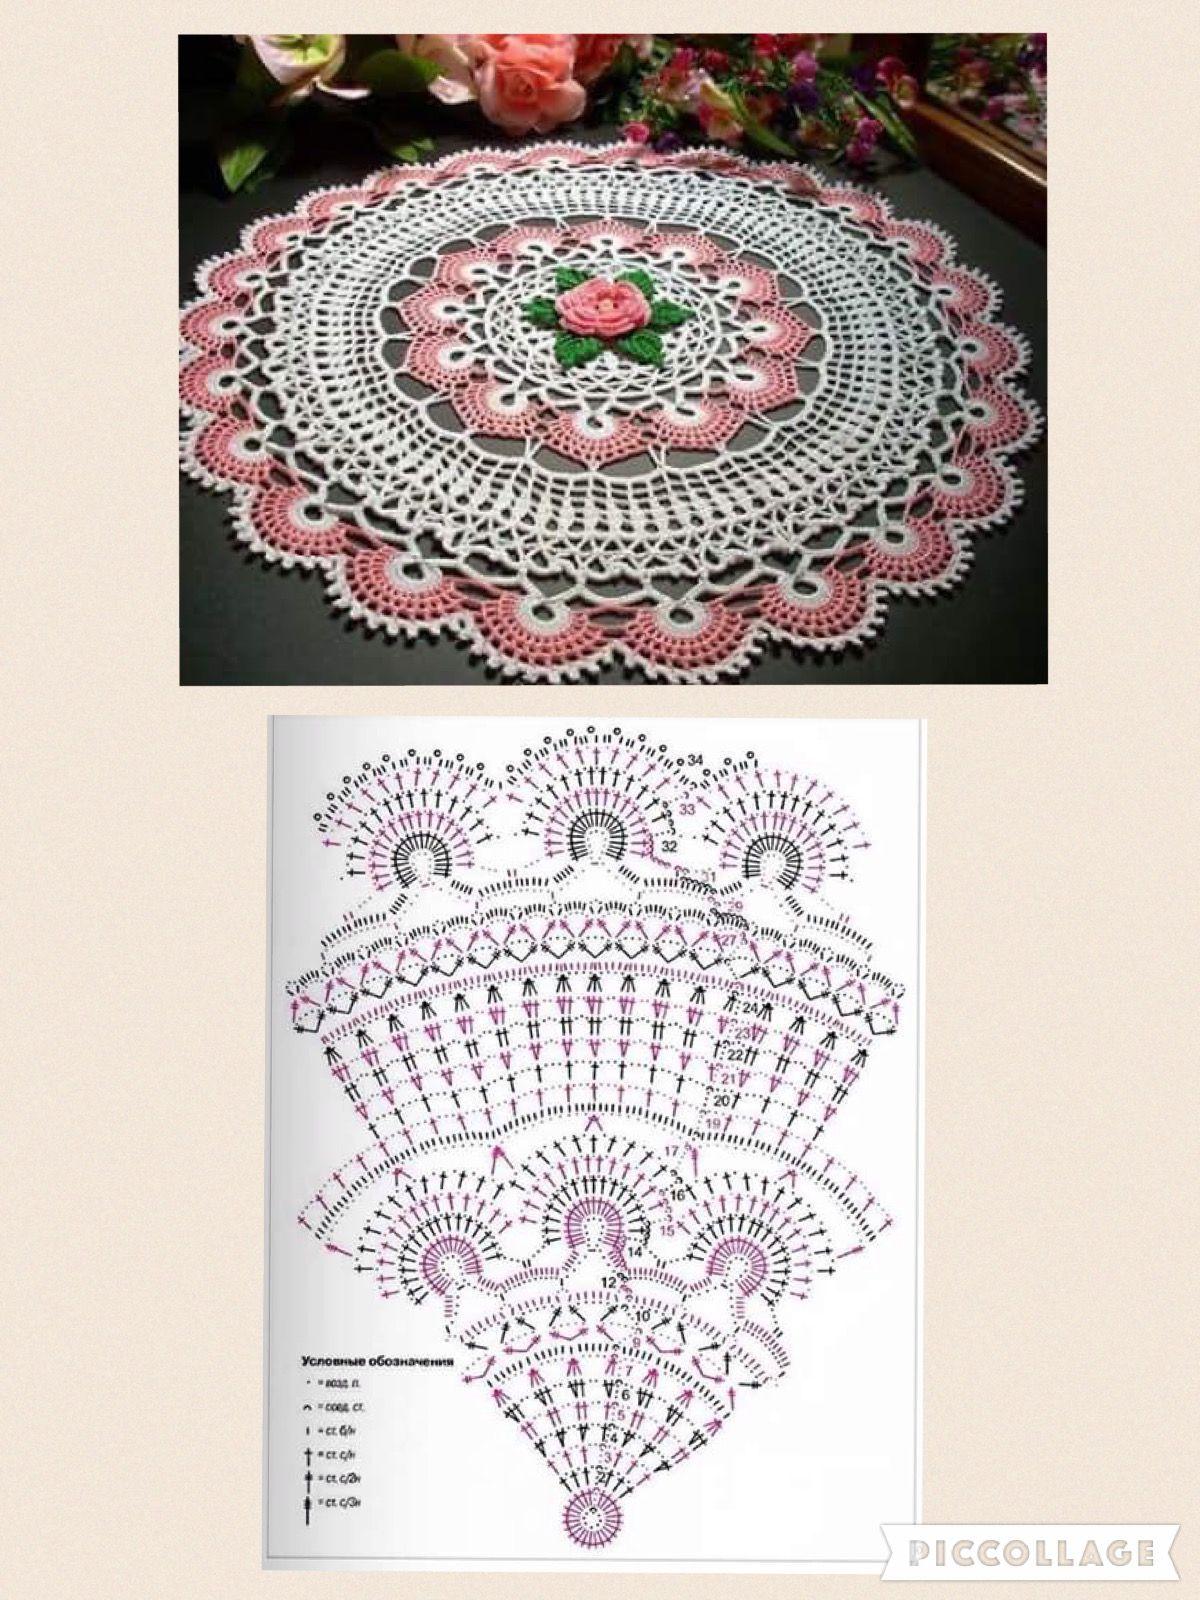 Pin de dorota1122 en serwetki ELEMENTY motywy | Pinterest | Carpeta ...